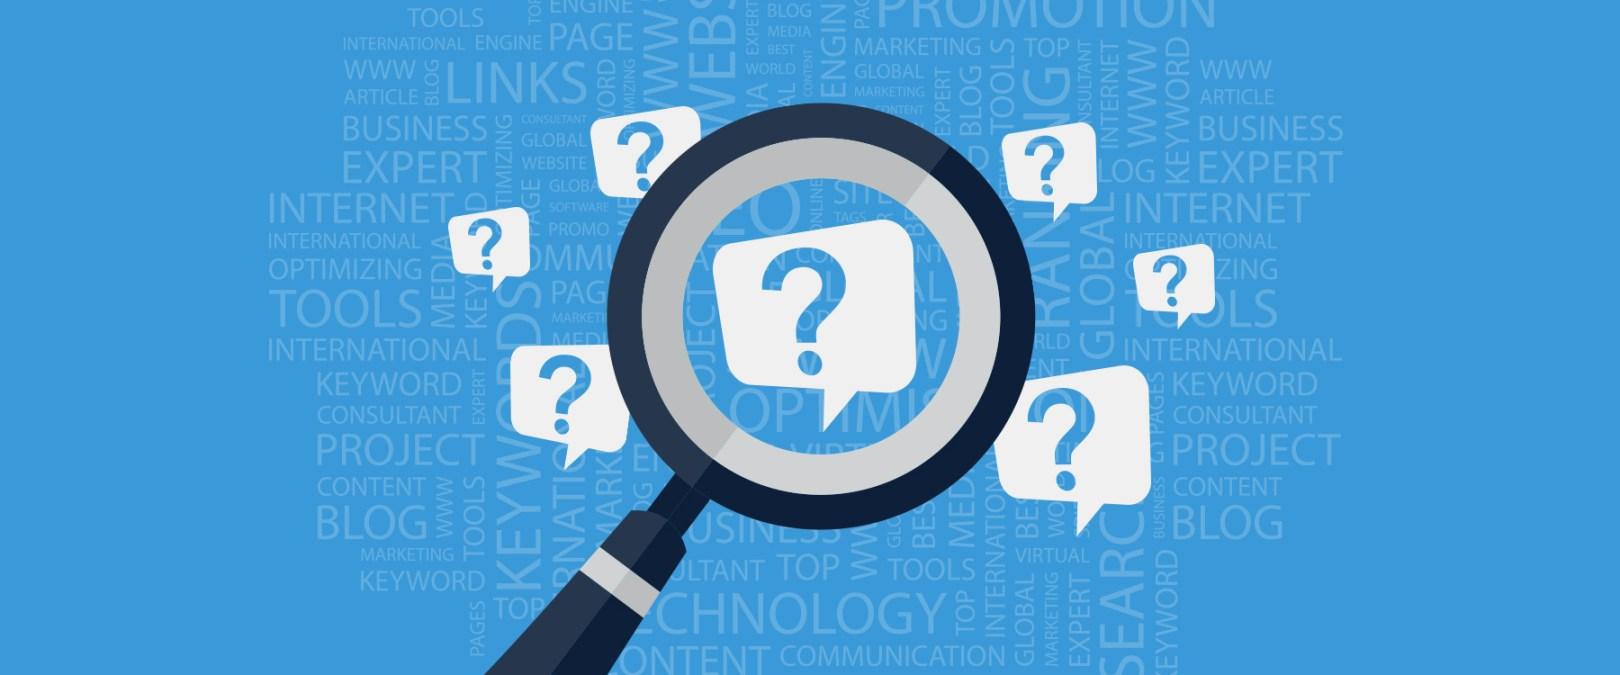 Do We Still Need Keywords? (Keyword Targeting VS. Topics)